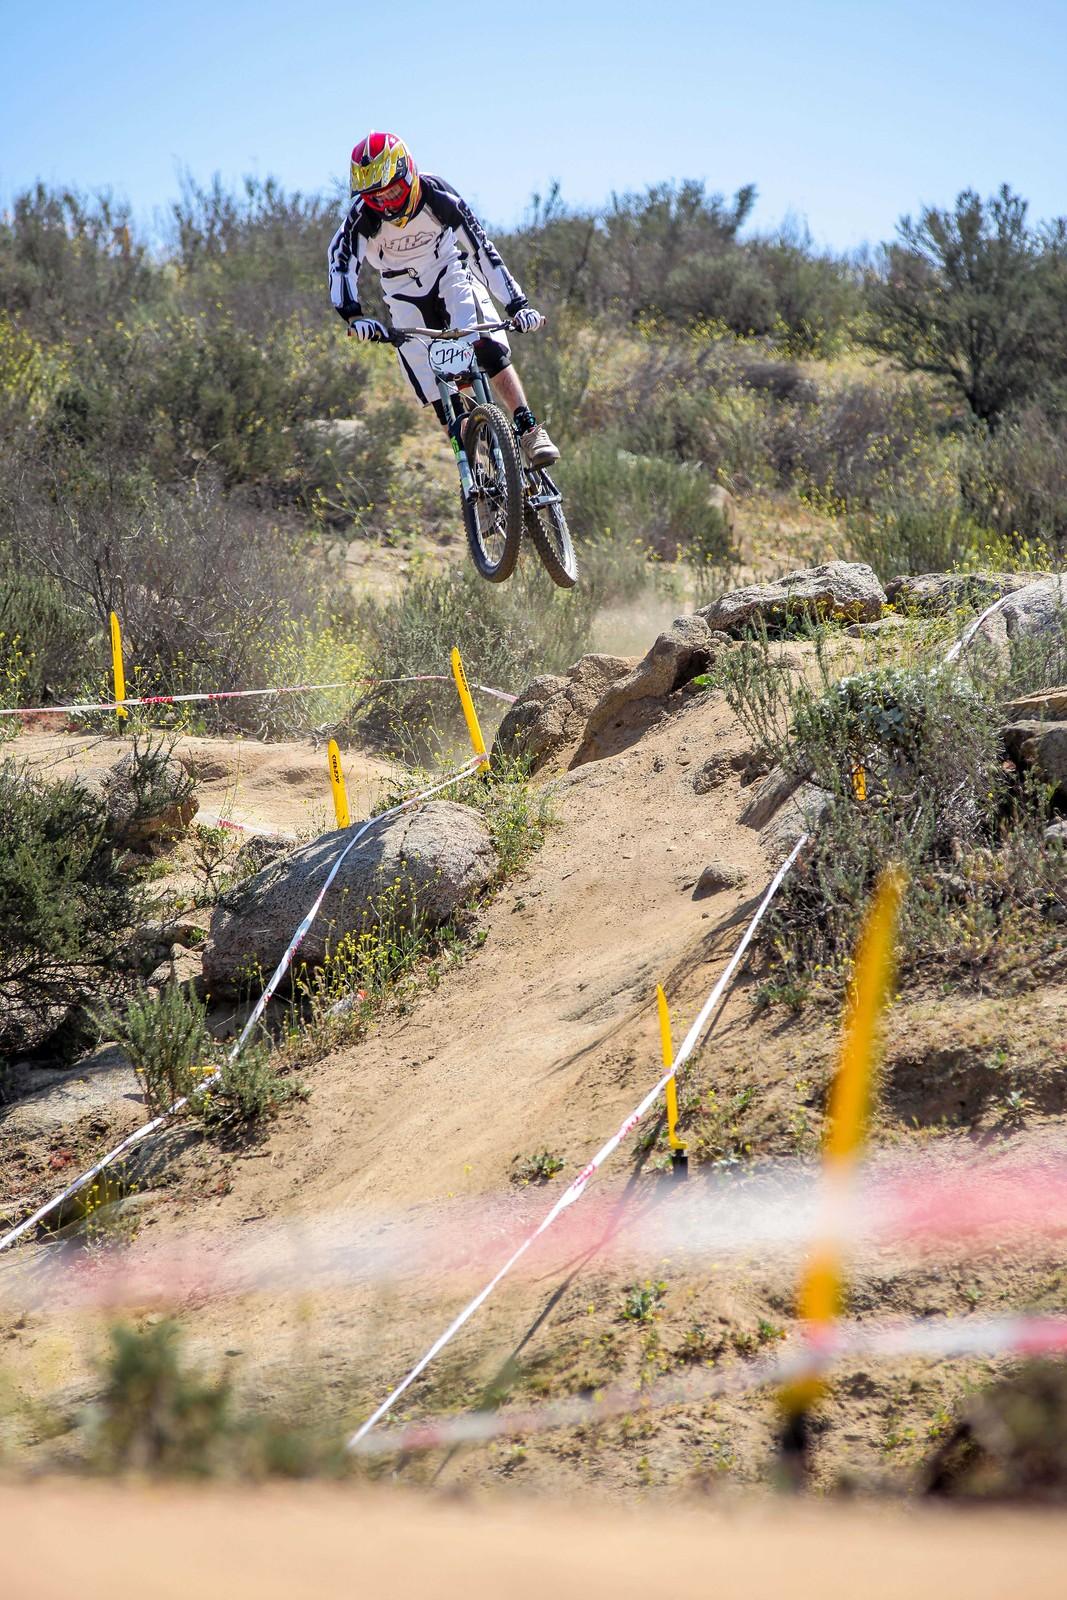 IMG 3238 - GnarHuck - Mountain Biking Pictures - Vital MTB